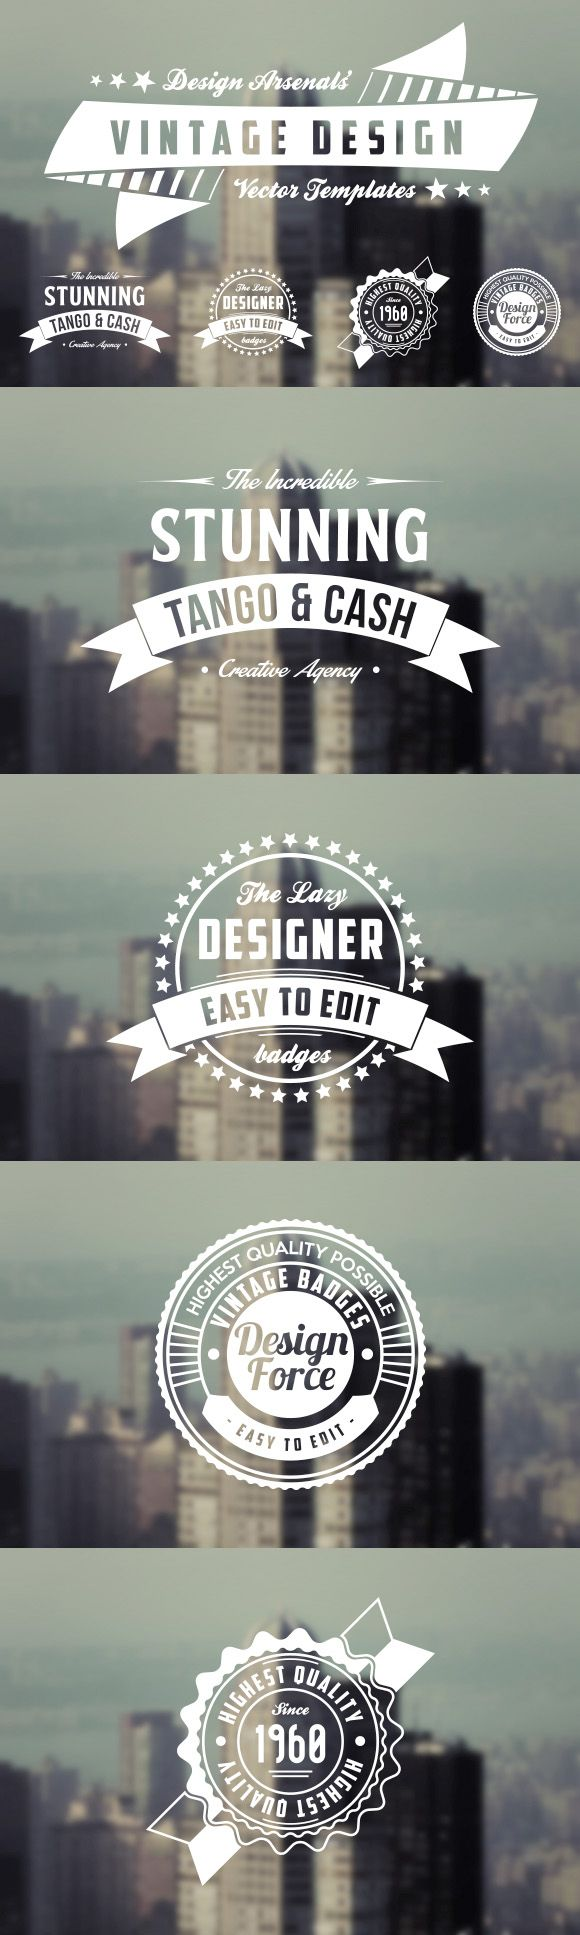 Retro Logo & Badge Templates #design Download: https://creativemarket.com/DesignBeagle/21314-Retro-Logo-Badge-Templates?u=ksioks